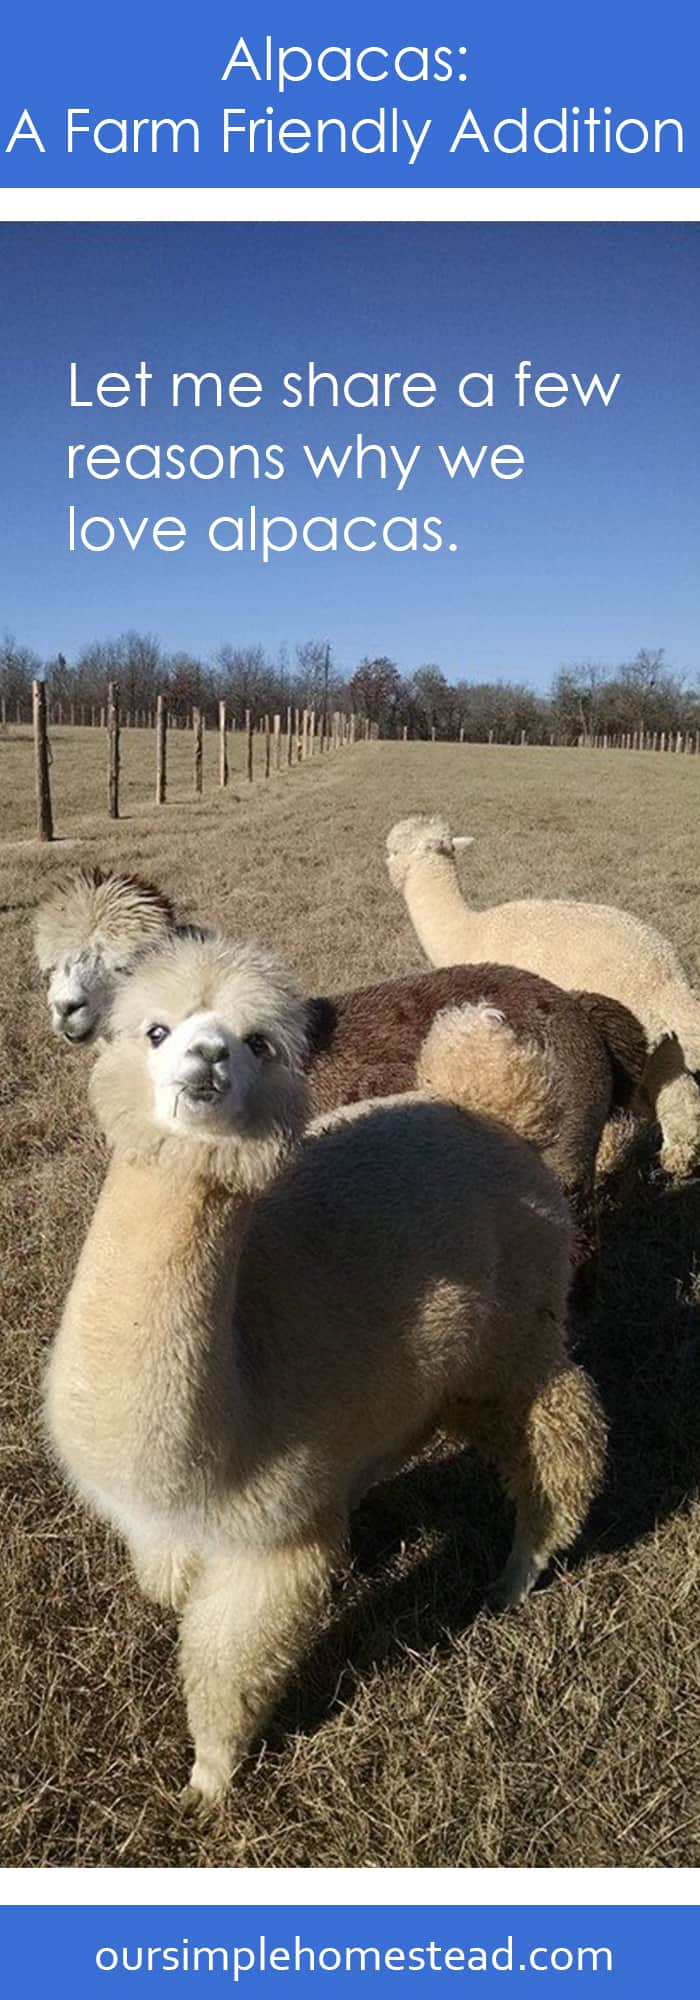 Why we love alpacas!